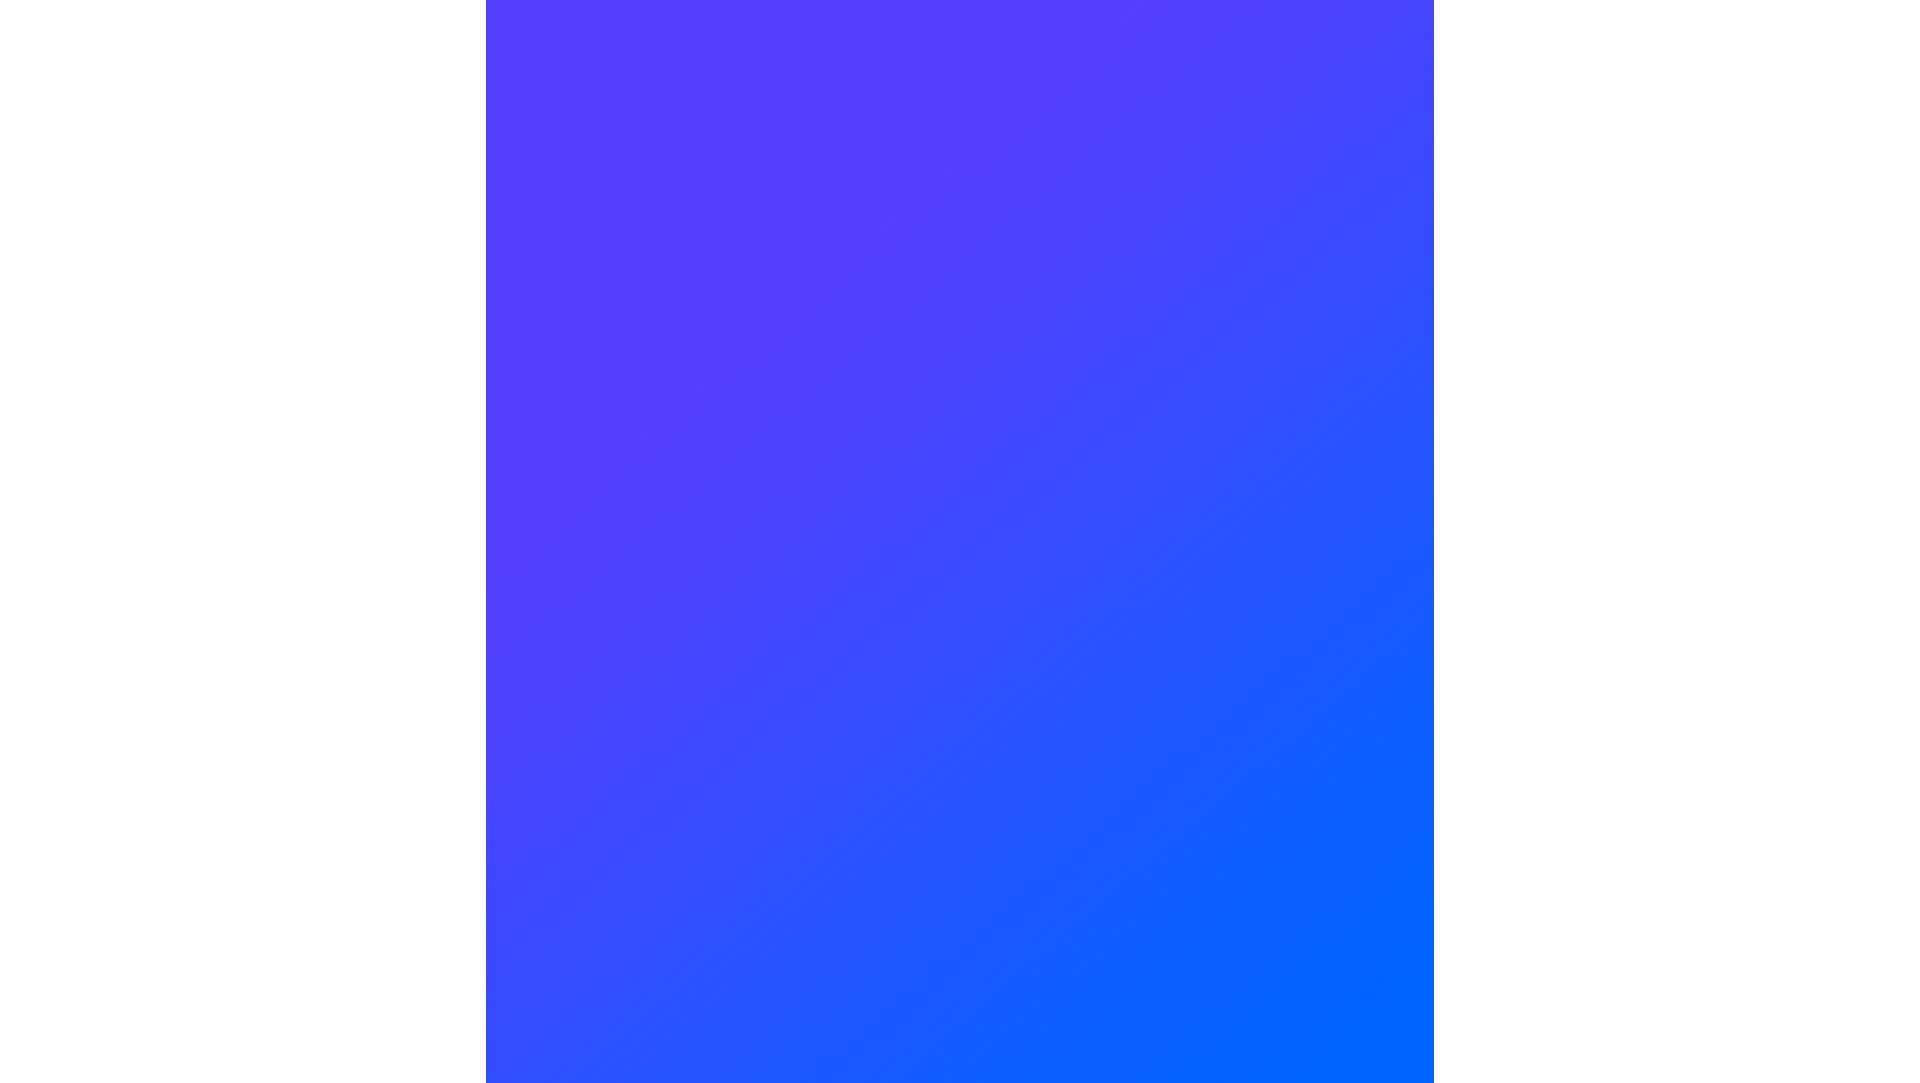 user-tie-solid_Blauverlauf